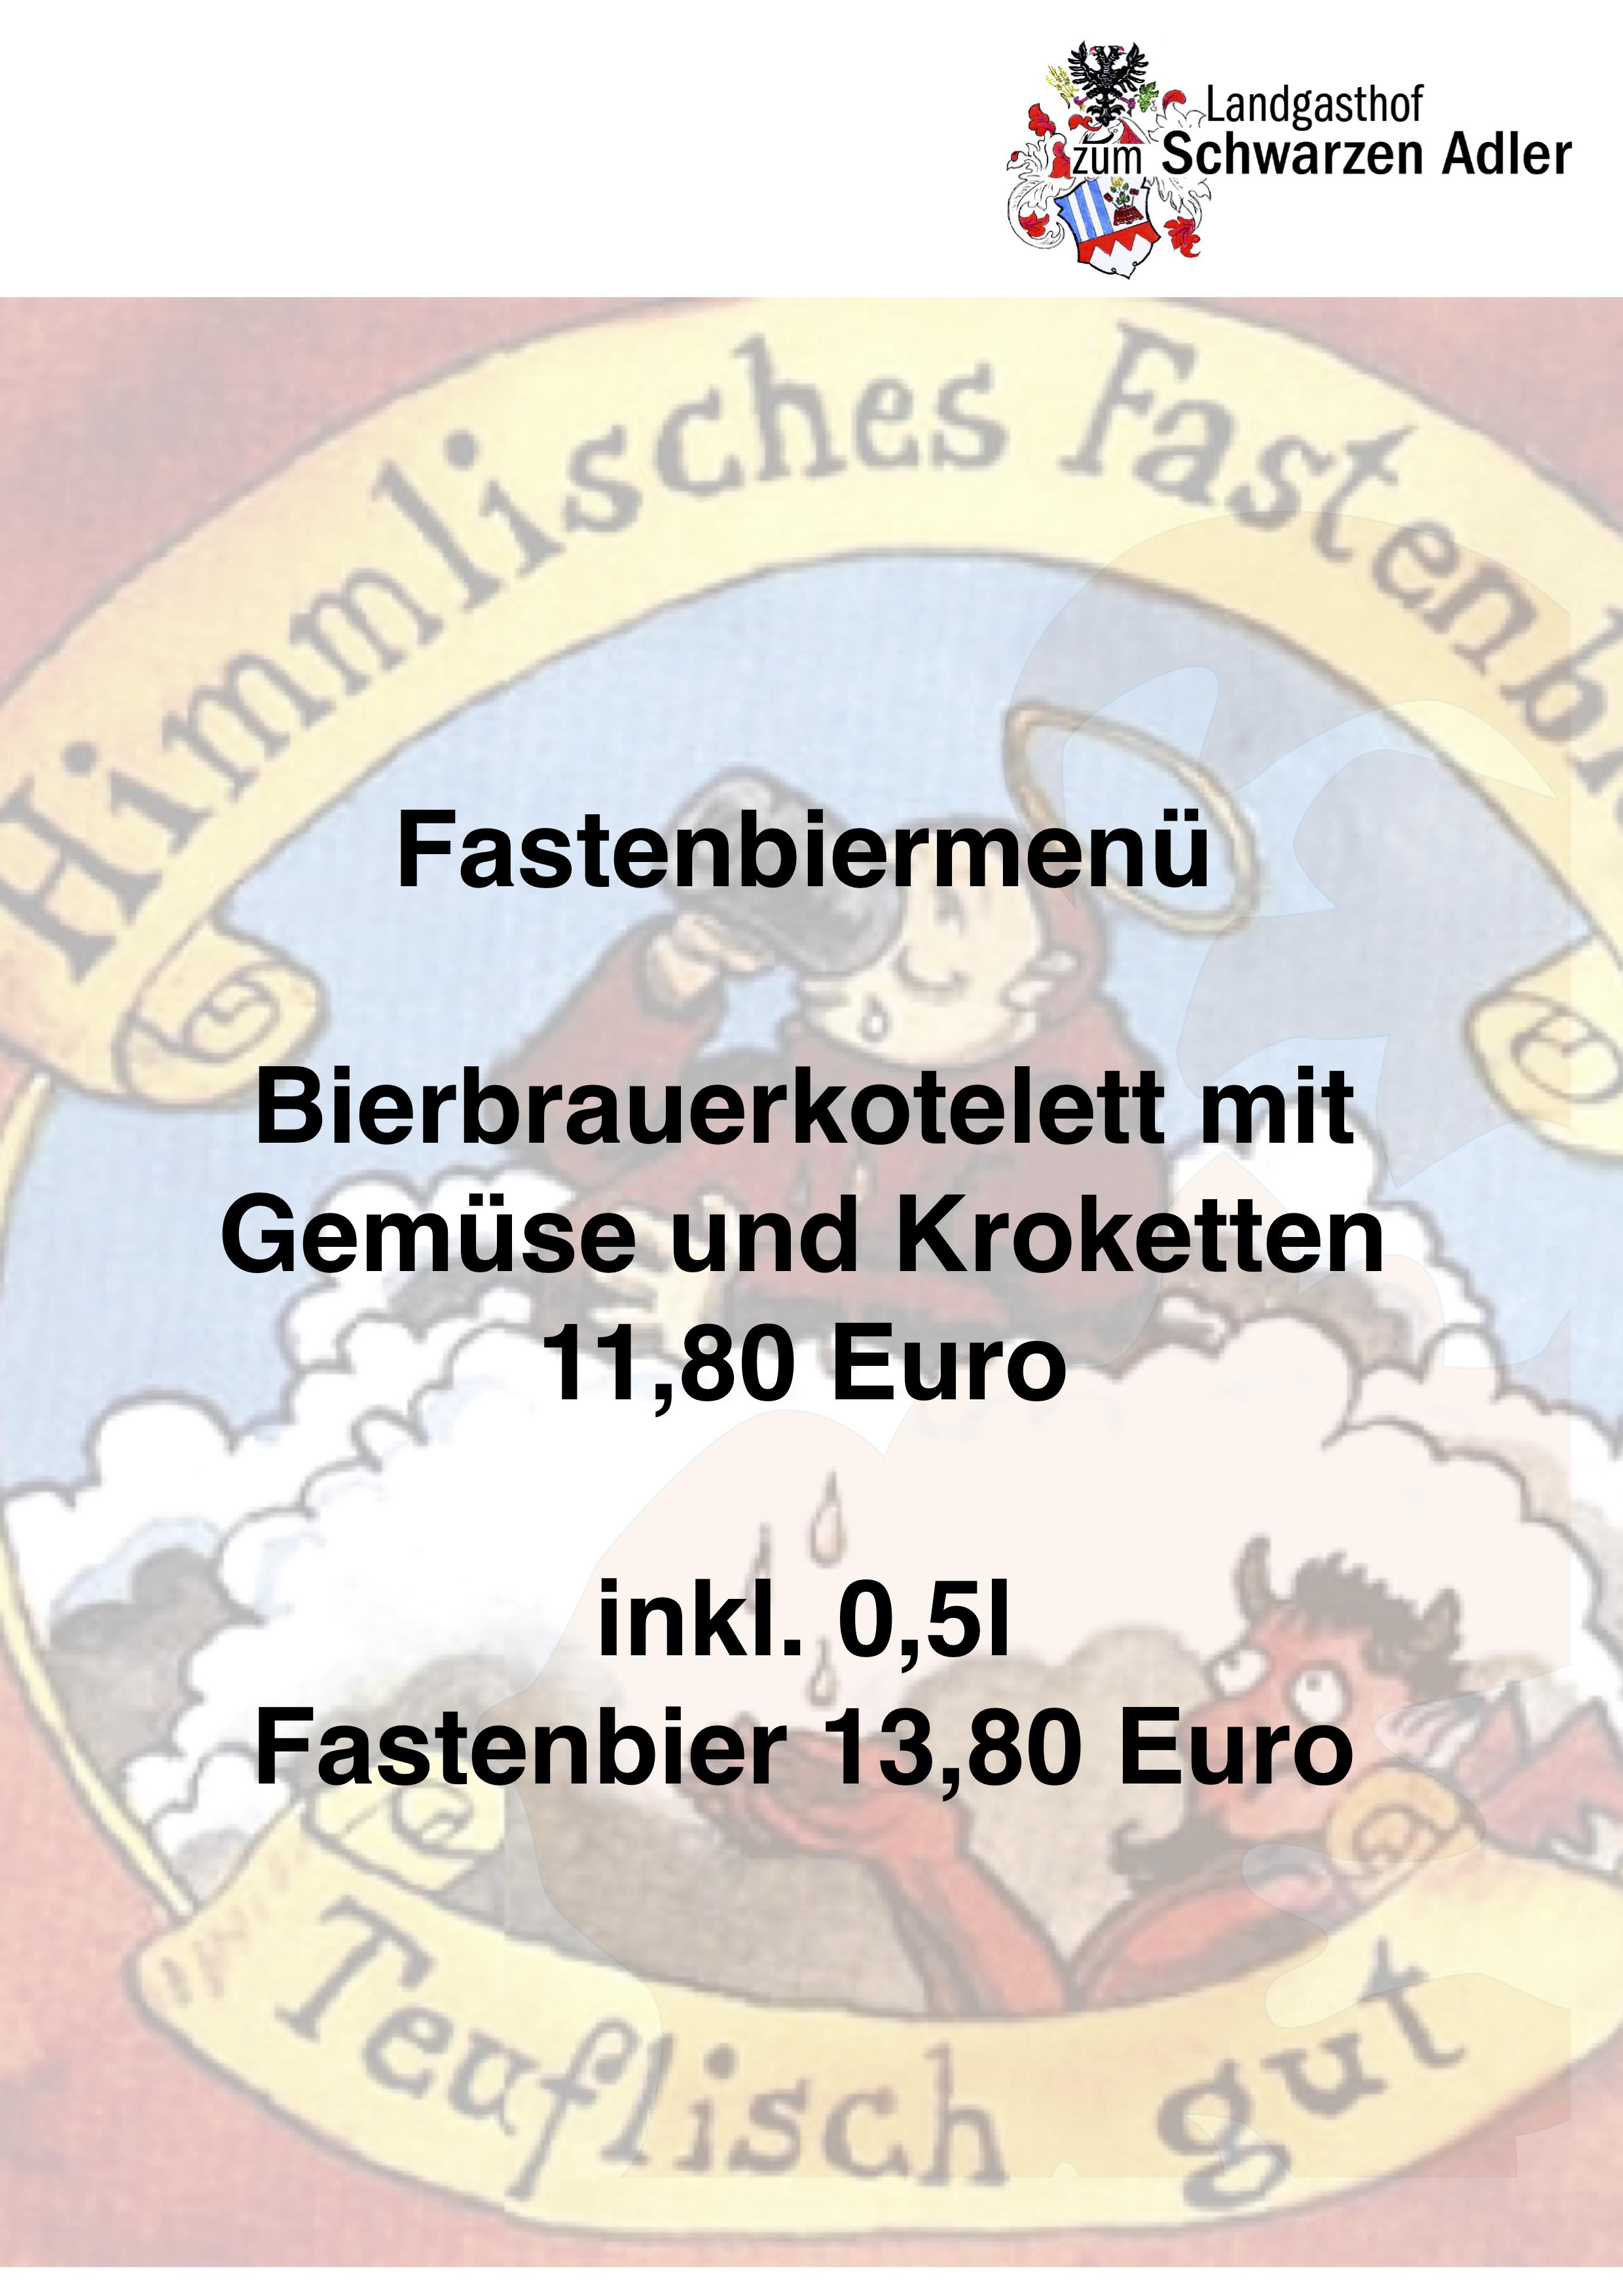 FastenbierSpeisenkarte2019